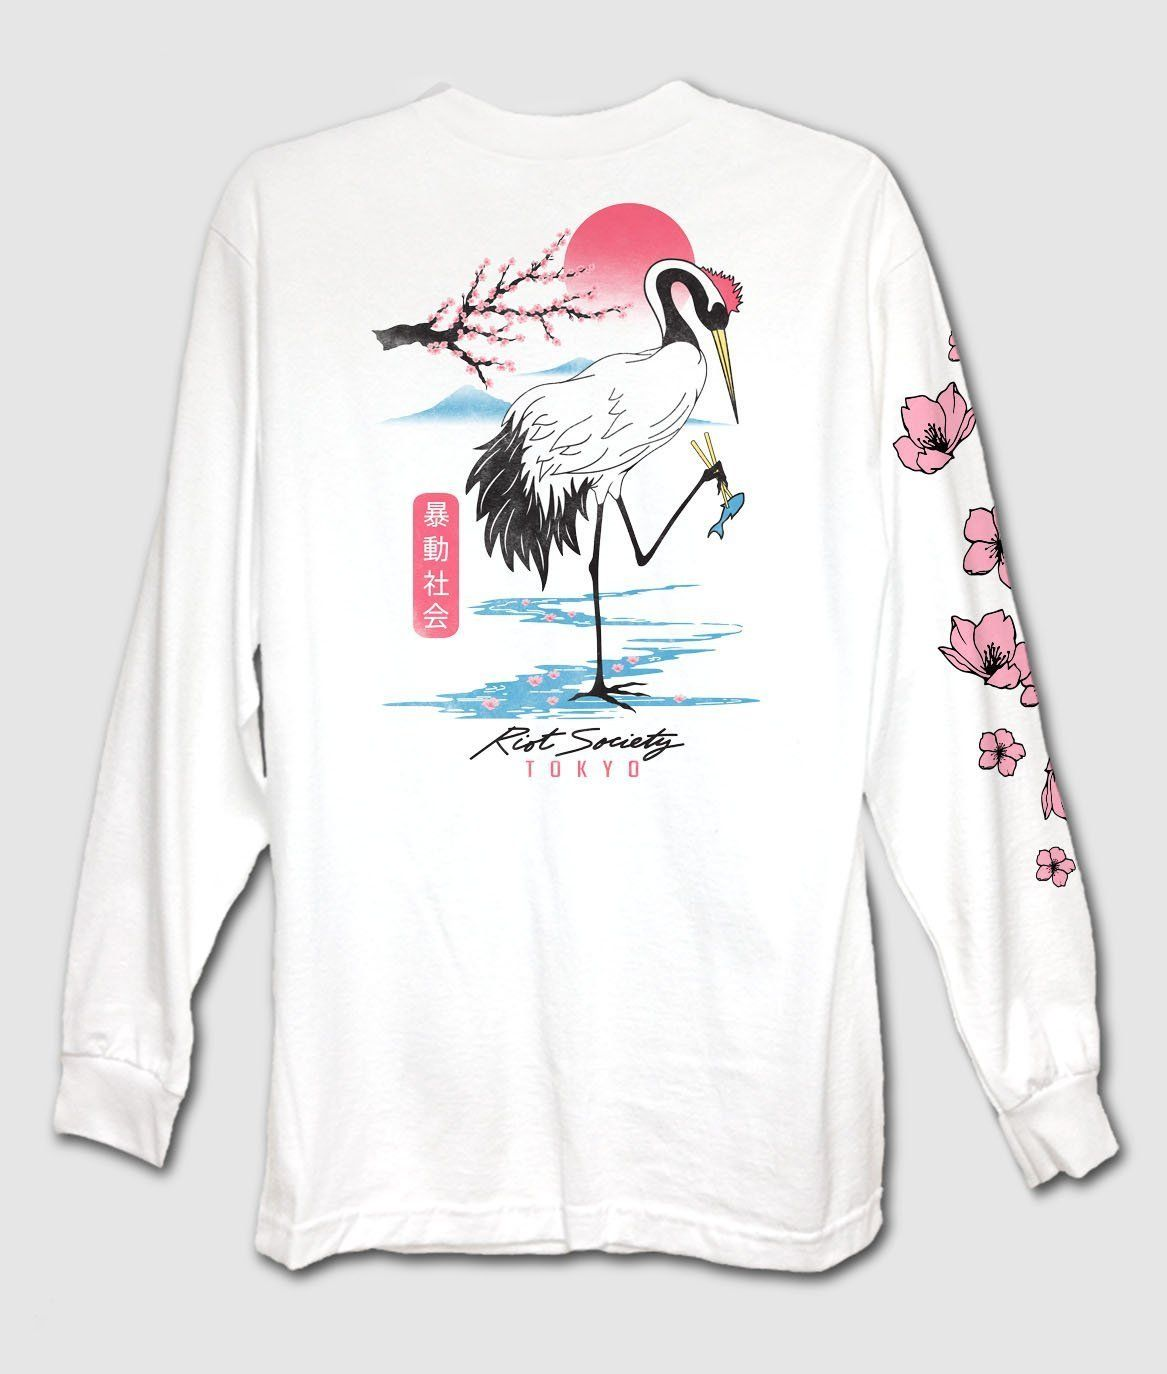 Kawaii Aesthetic Clothes Amazon